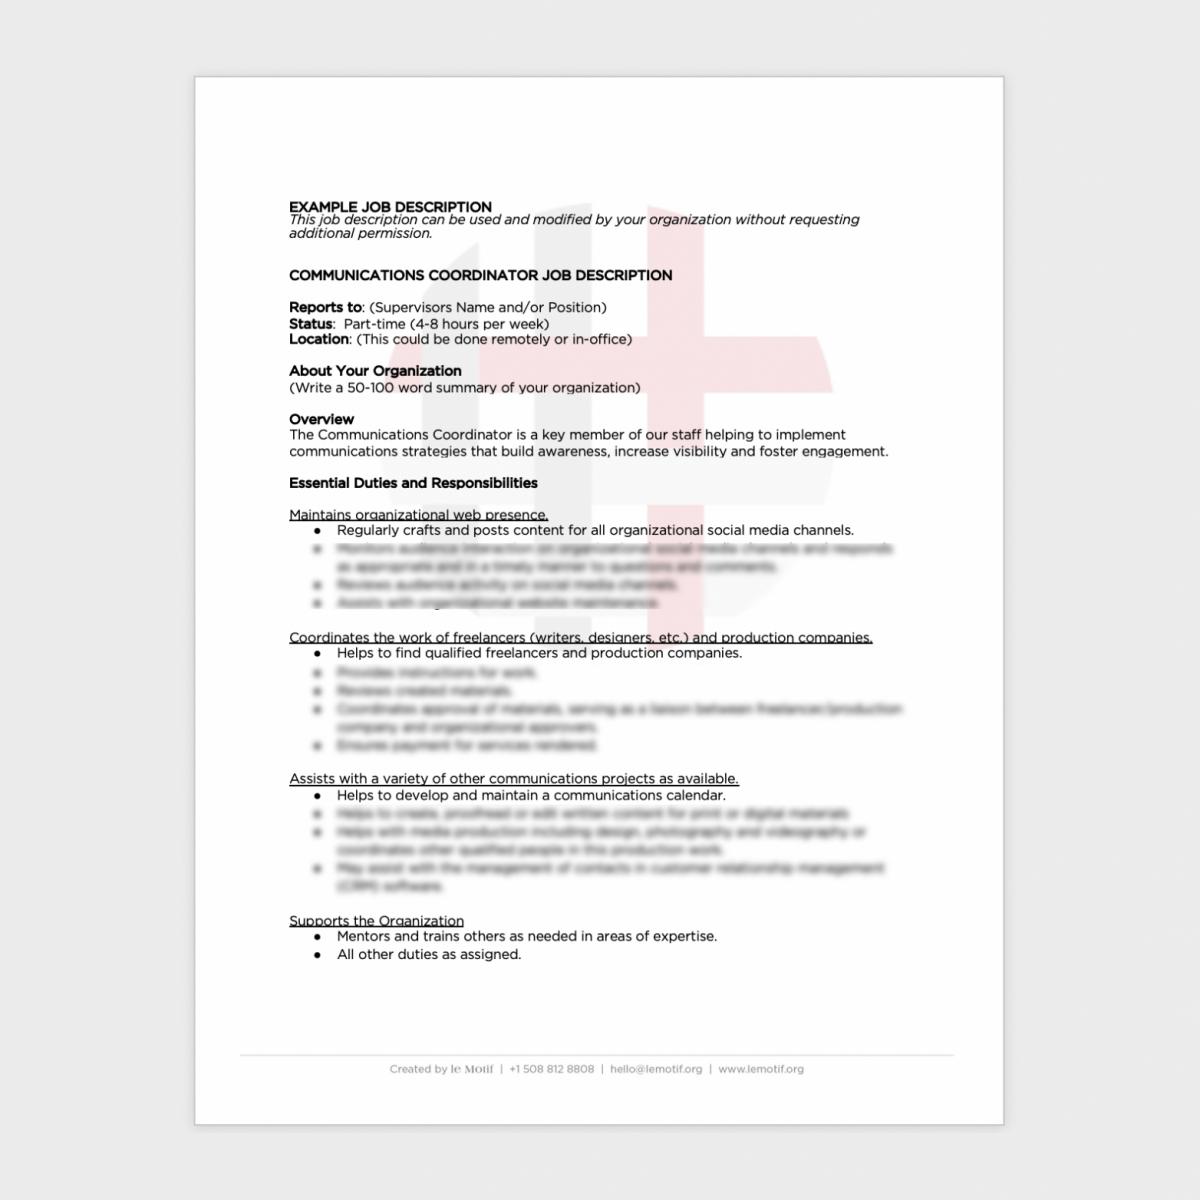 Communication Coordinator Job Description